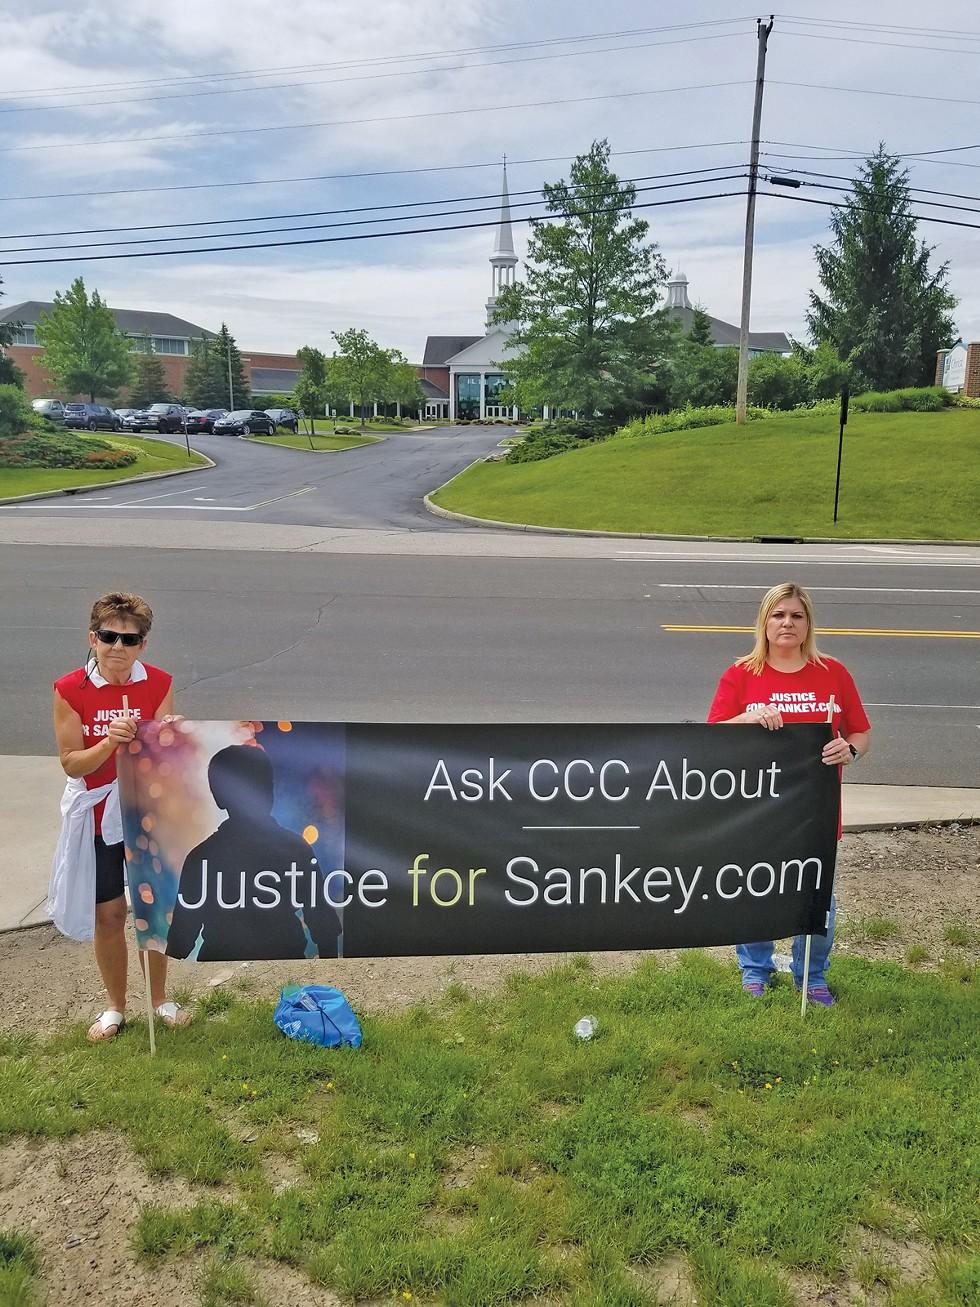 Cari Gintz and Sarah Klingler outside Christ Community Chapel in June. - PHOTO COURTESY SARAH KLINGLER